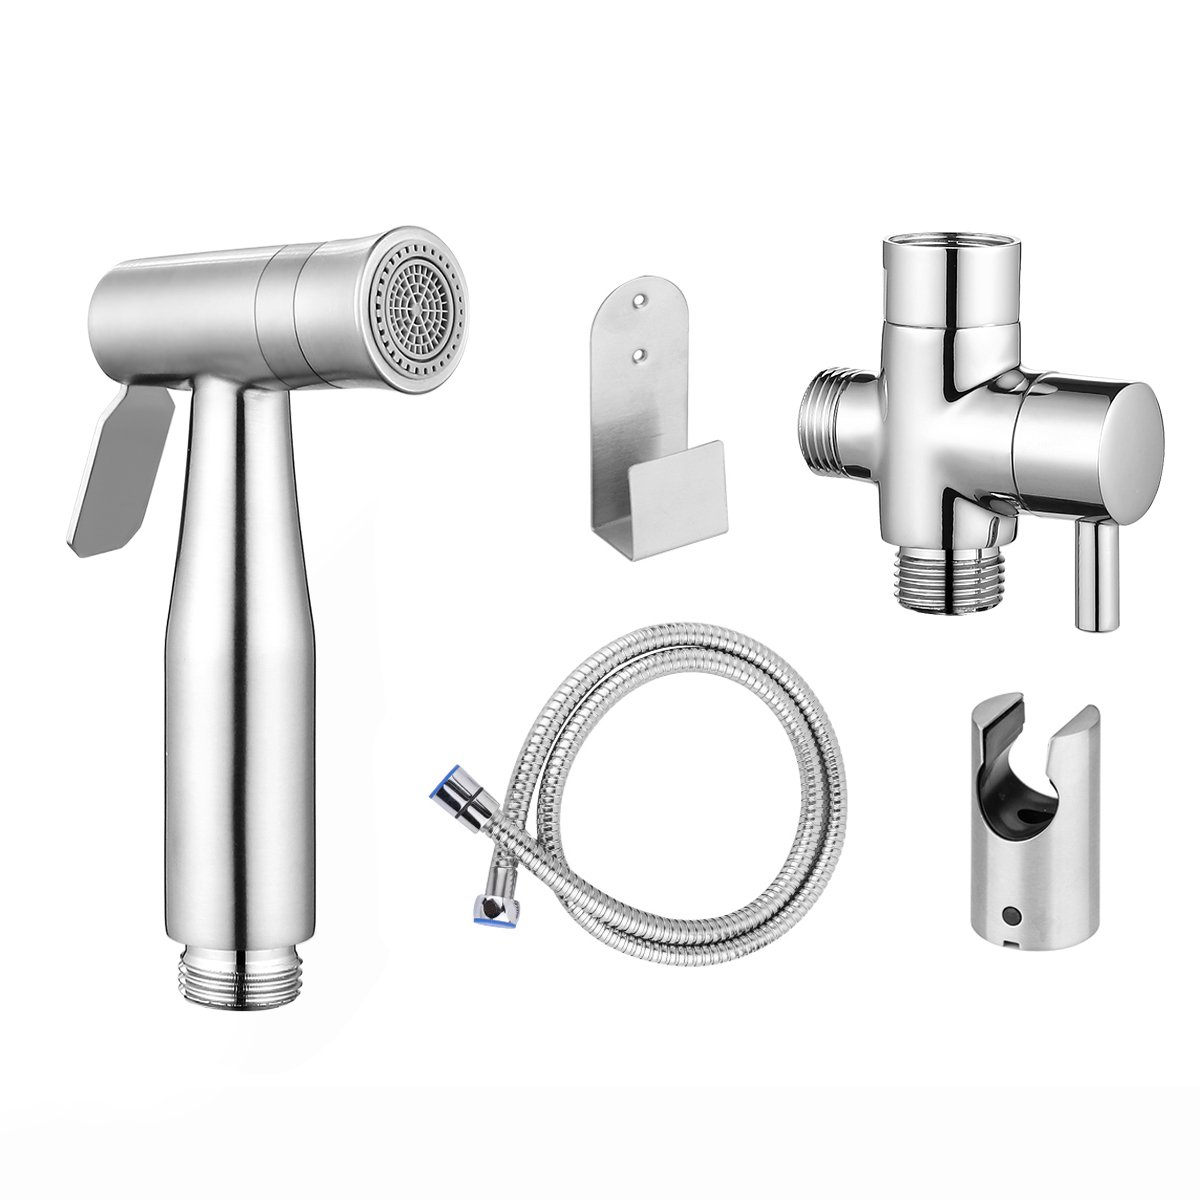 Bidet Sprayer, Konesky Cloth Diaper Sprayer Premium Stainless Steel Bathroom Handheld Bidet Shattaf Sprayer, For Personal Hygiene & Cleaning Care with T-adapter and Hose (Dual Sprayer Mode)